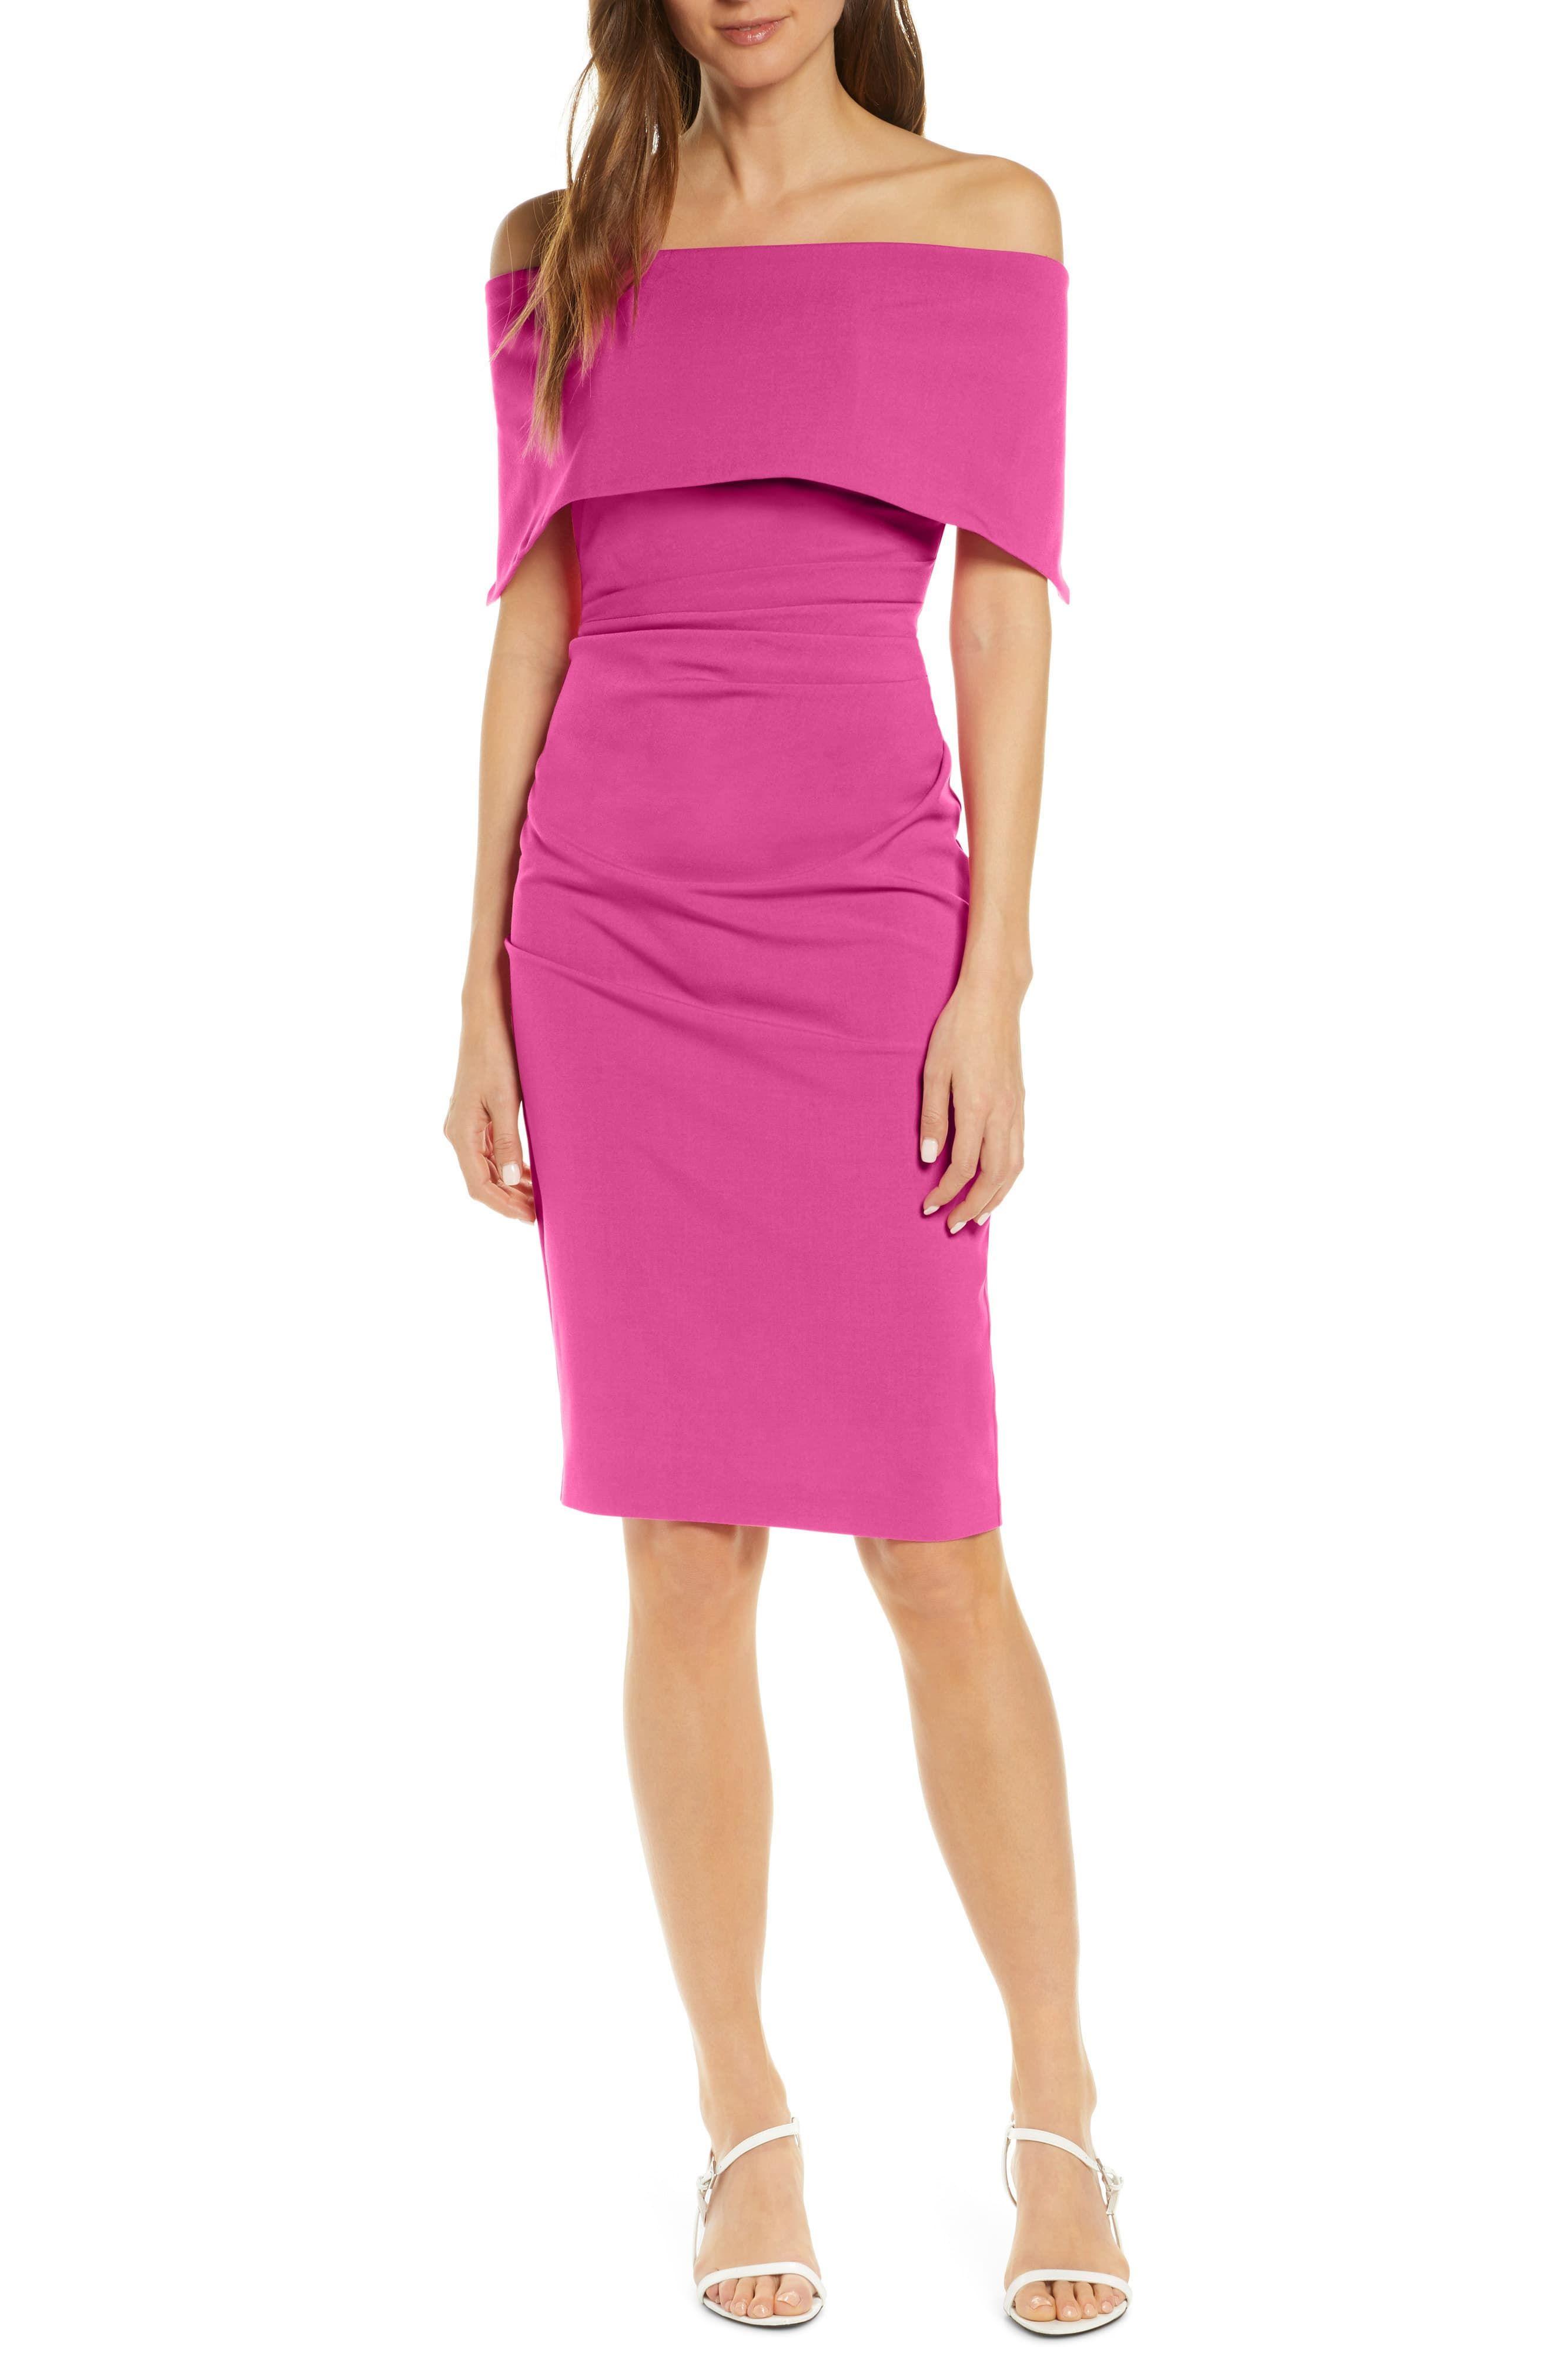 Vince Camuto Popover Cocktail Dress Regular Petite Nordstrom Classy Dress Dresses Cocktail Dress [ 4048 x 2640 Pixel ]